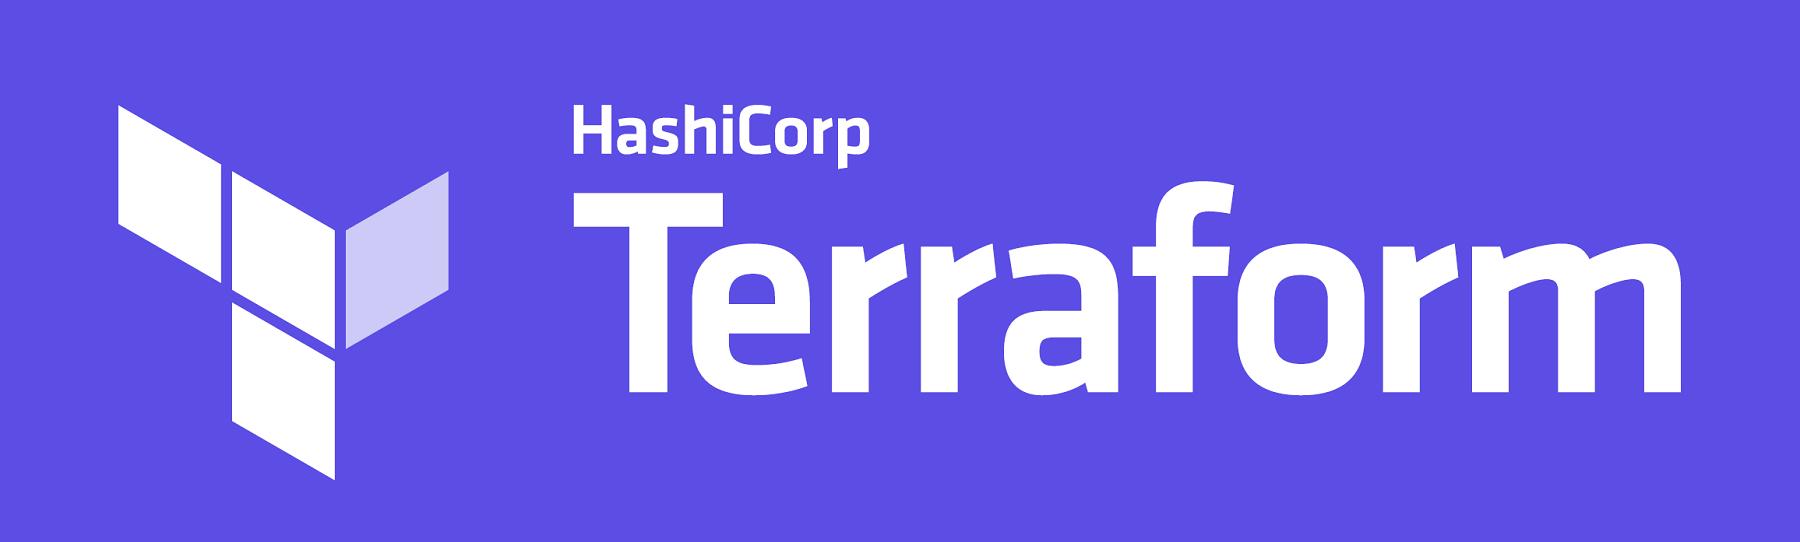 hashicorp-terraform-banner